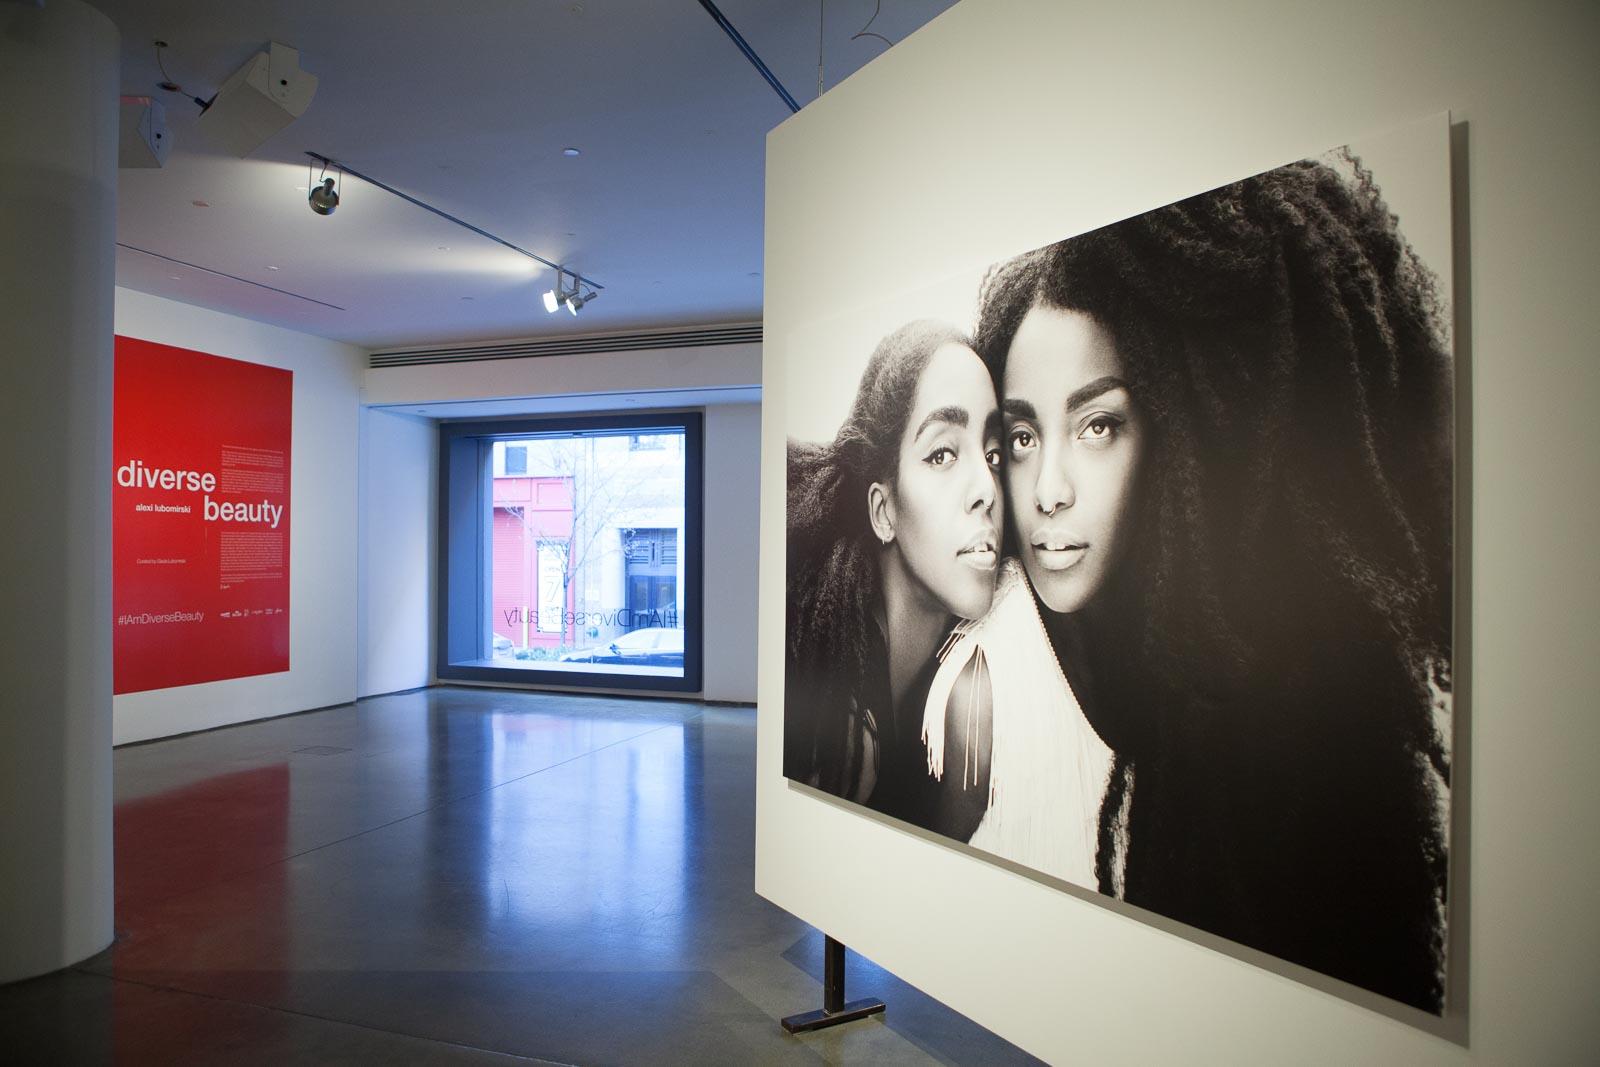 alexi-lubomirski-diverse-beauty-exhibition-robertiaga-8